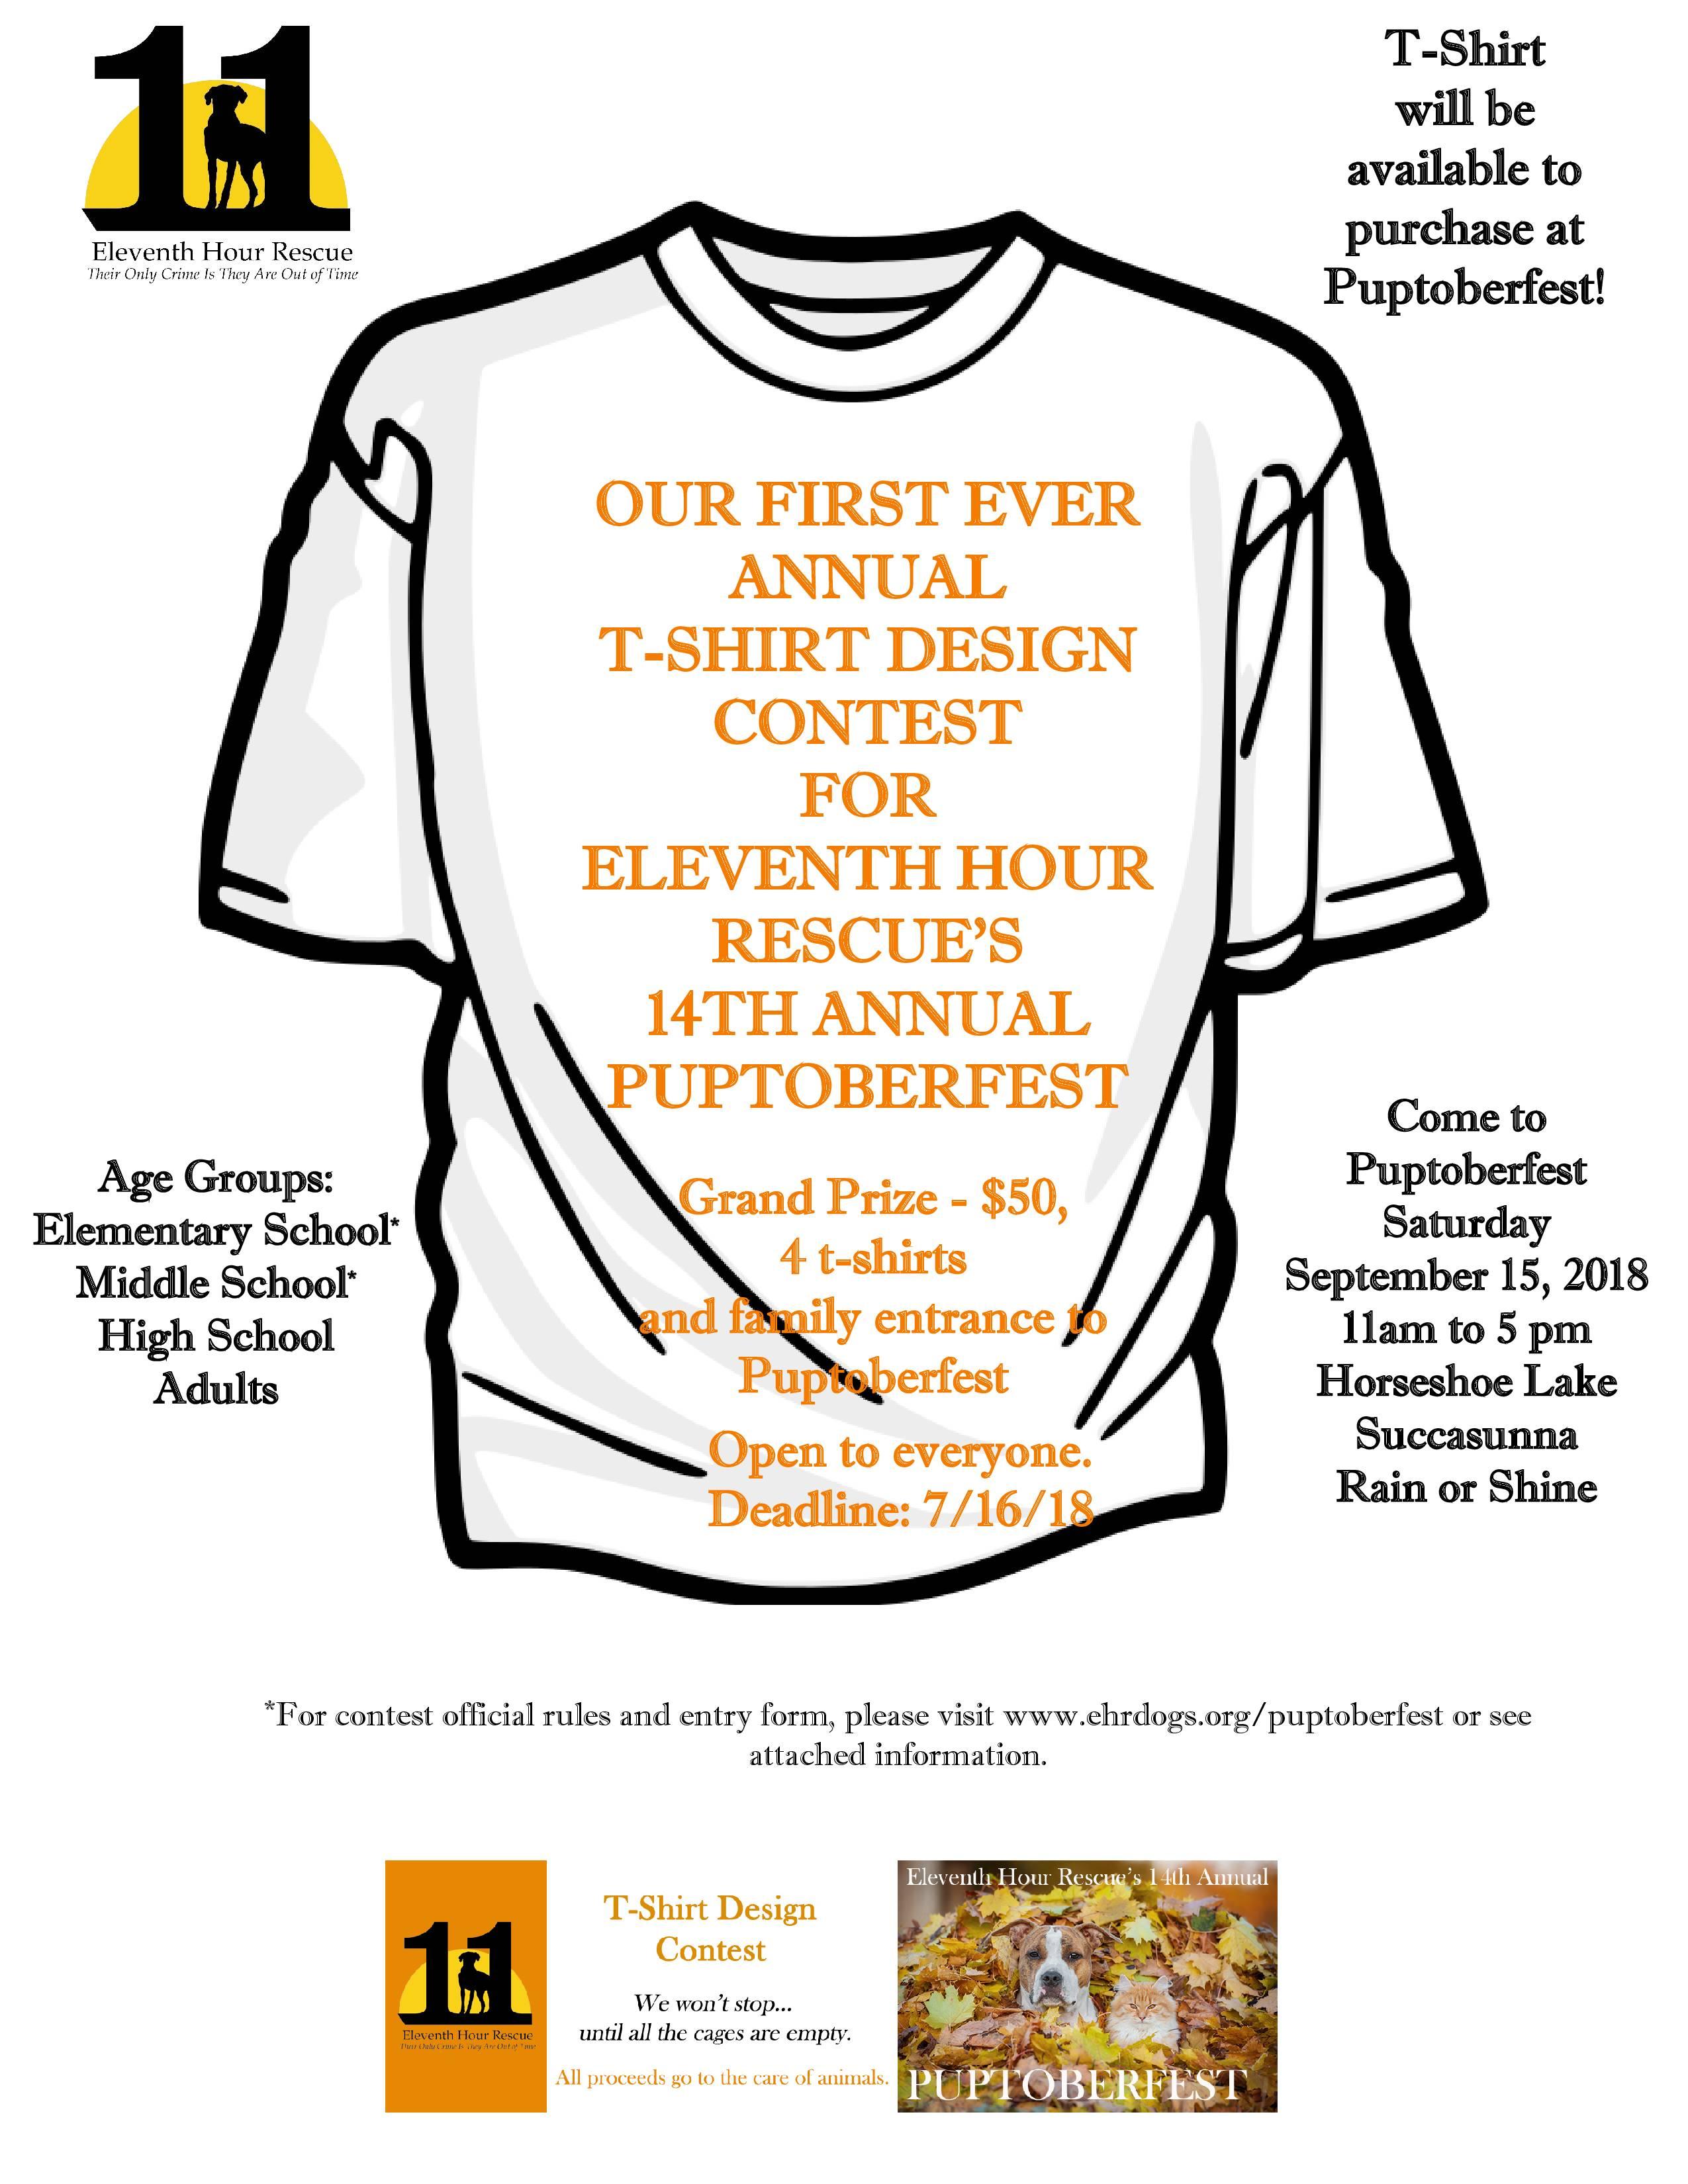 Puptoberfest Tshirt Contest